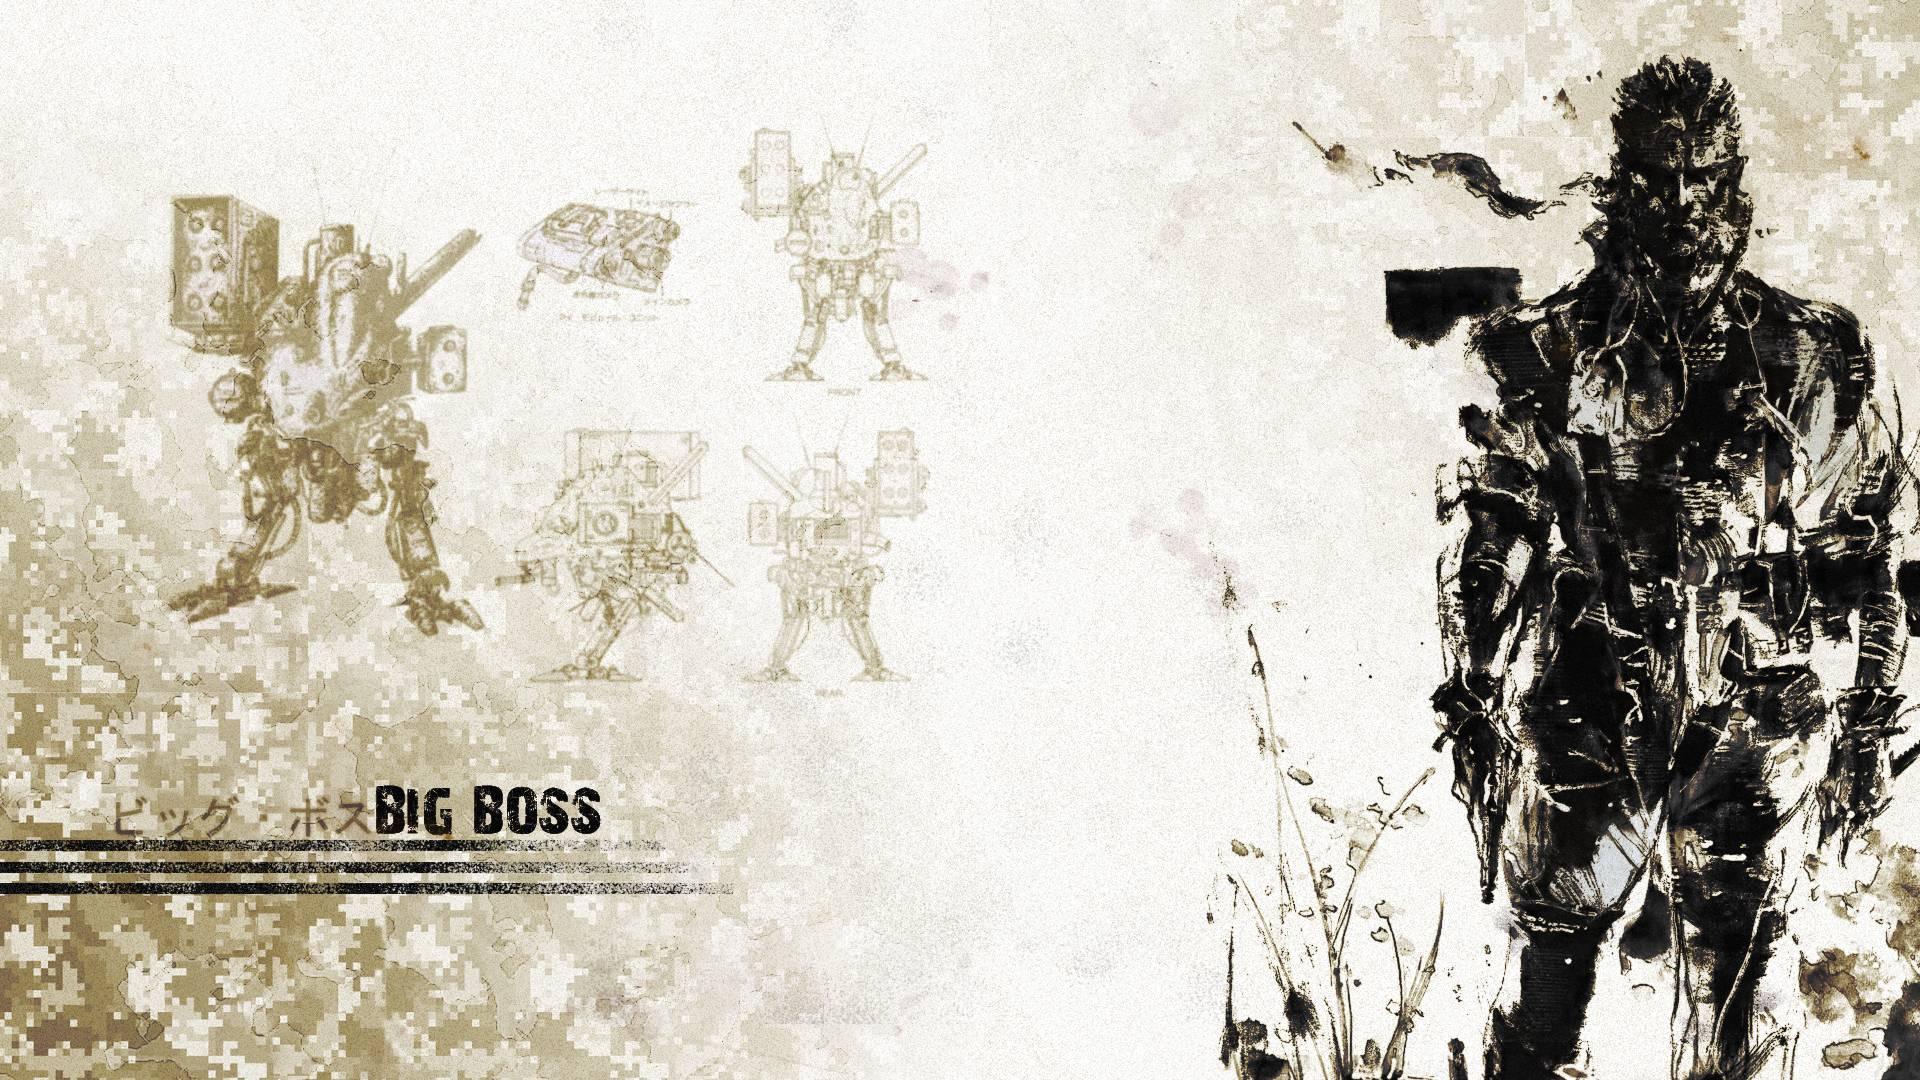 big boss wallpapers wallpaper cave